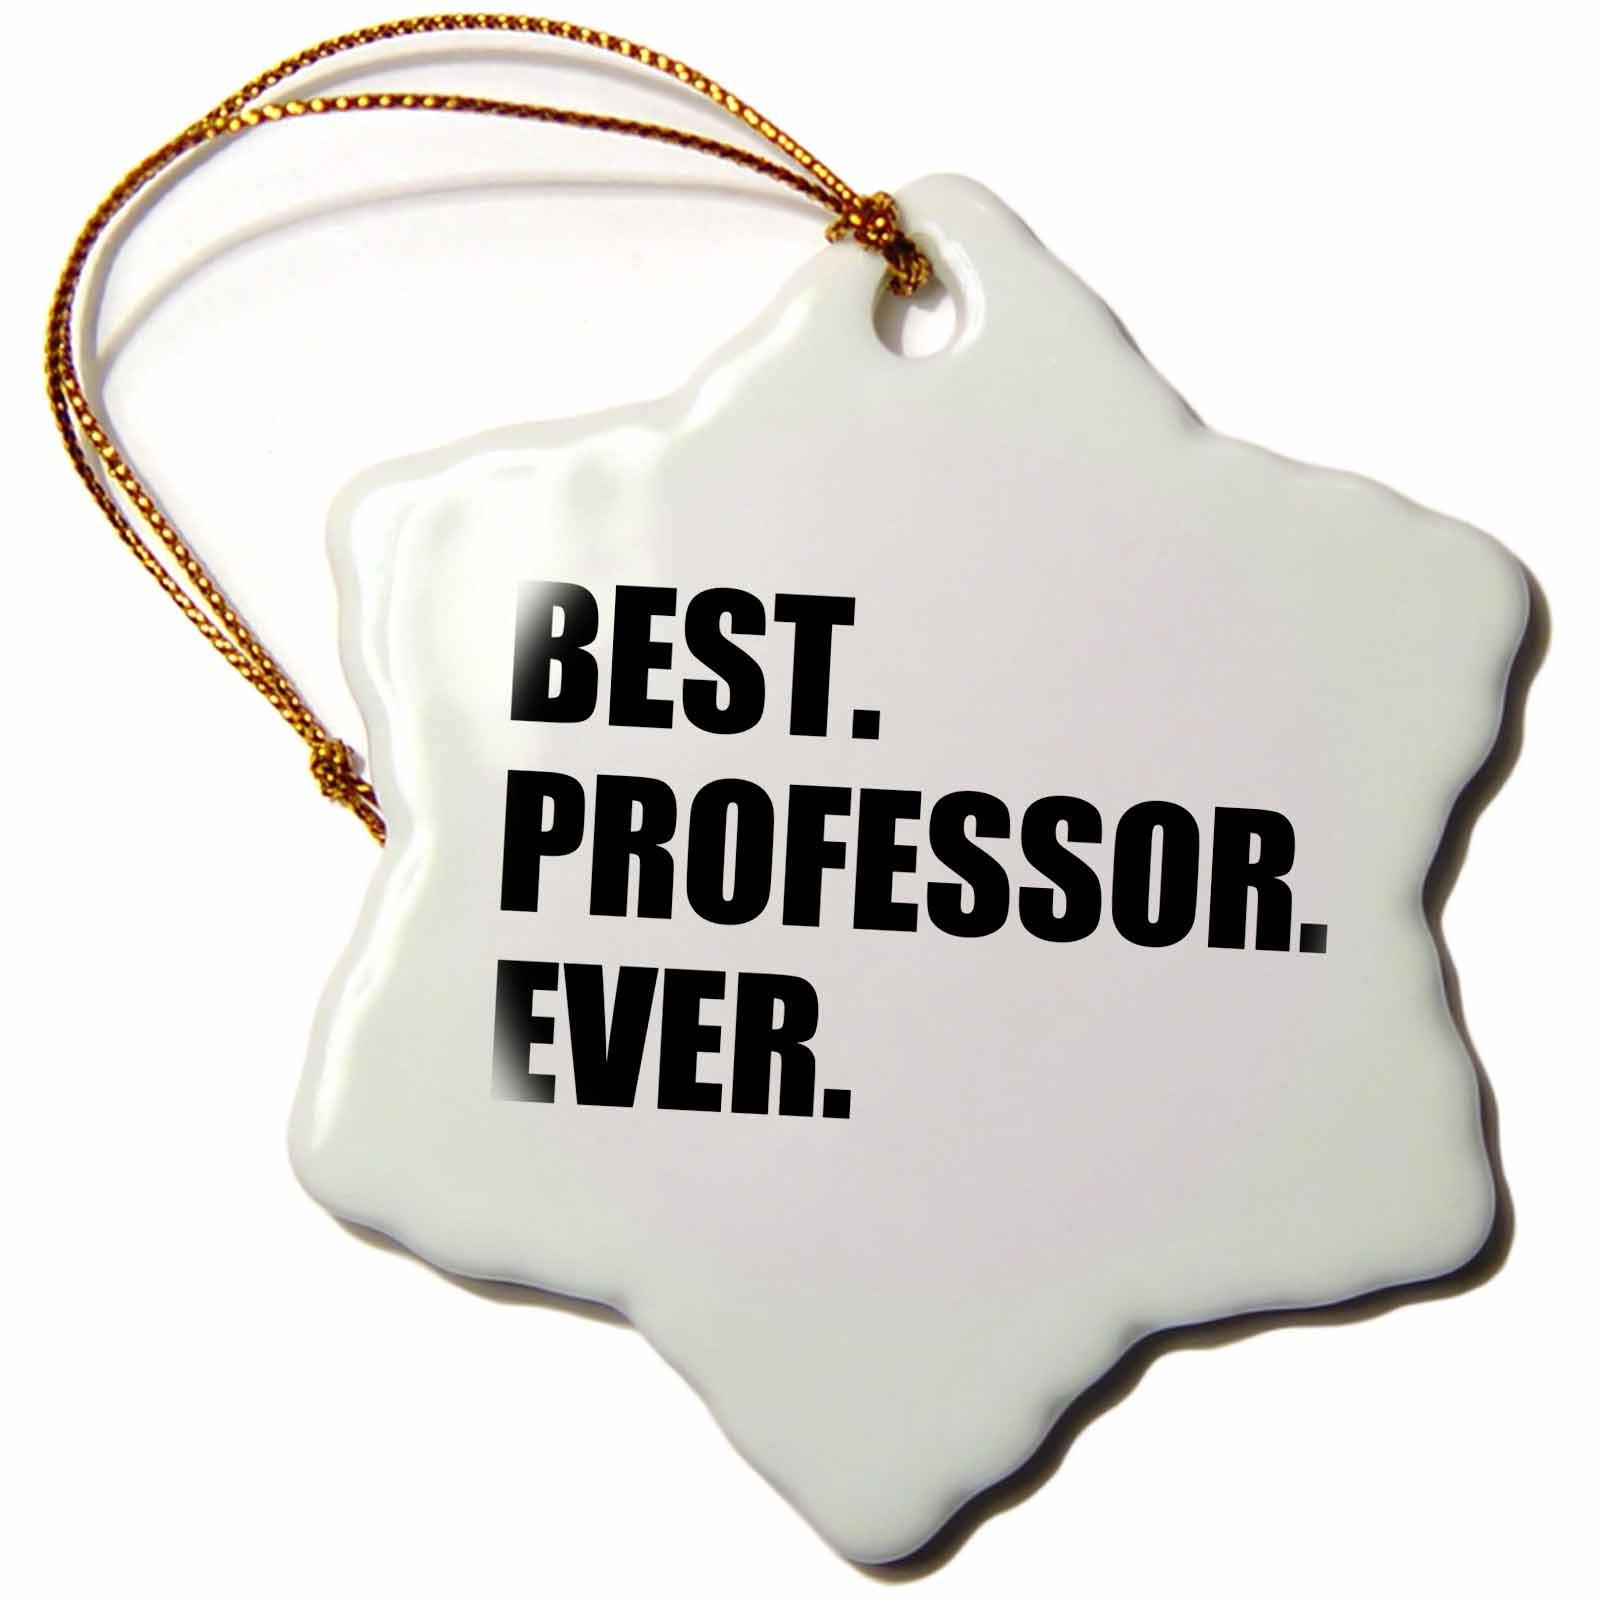 3dRose orn_185014_1 Best Professor Ever, Gift for Inspiring College University Lecturers Snowflake Porcelain Ornament, 3''